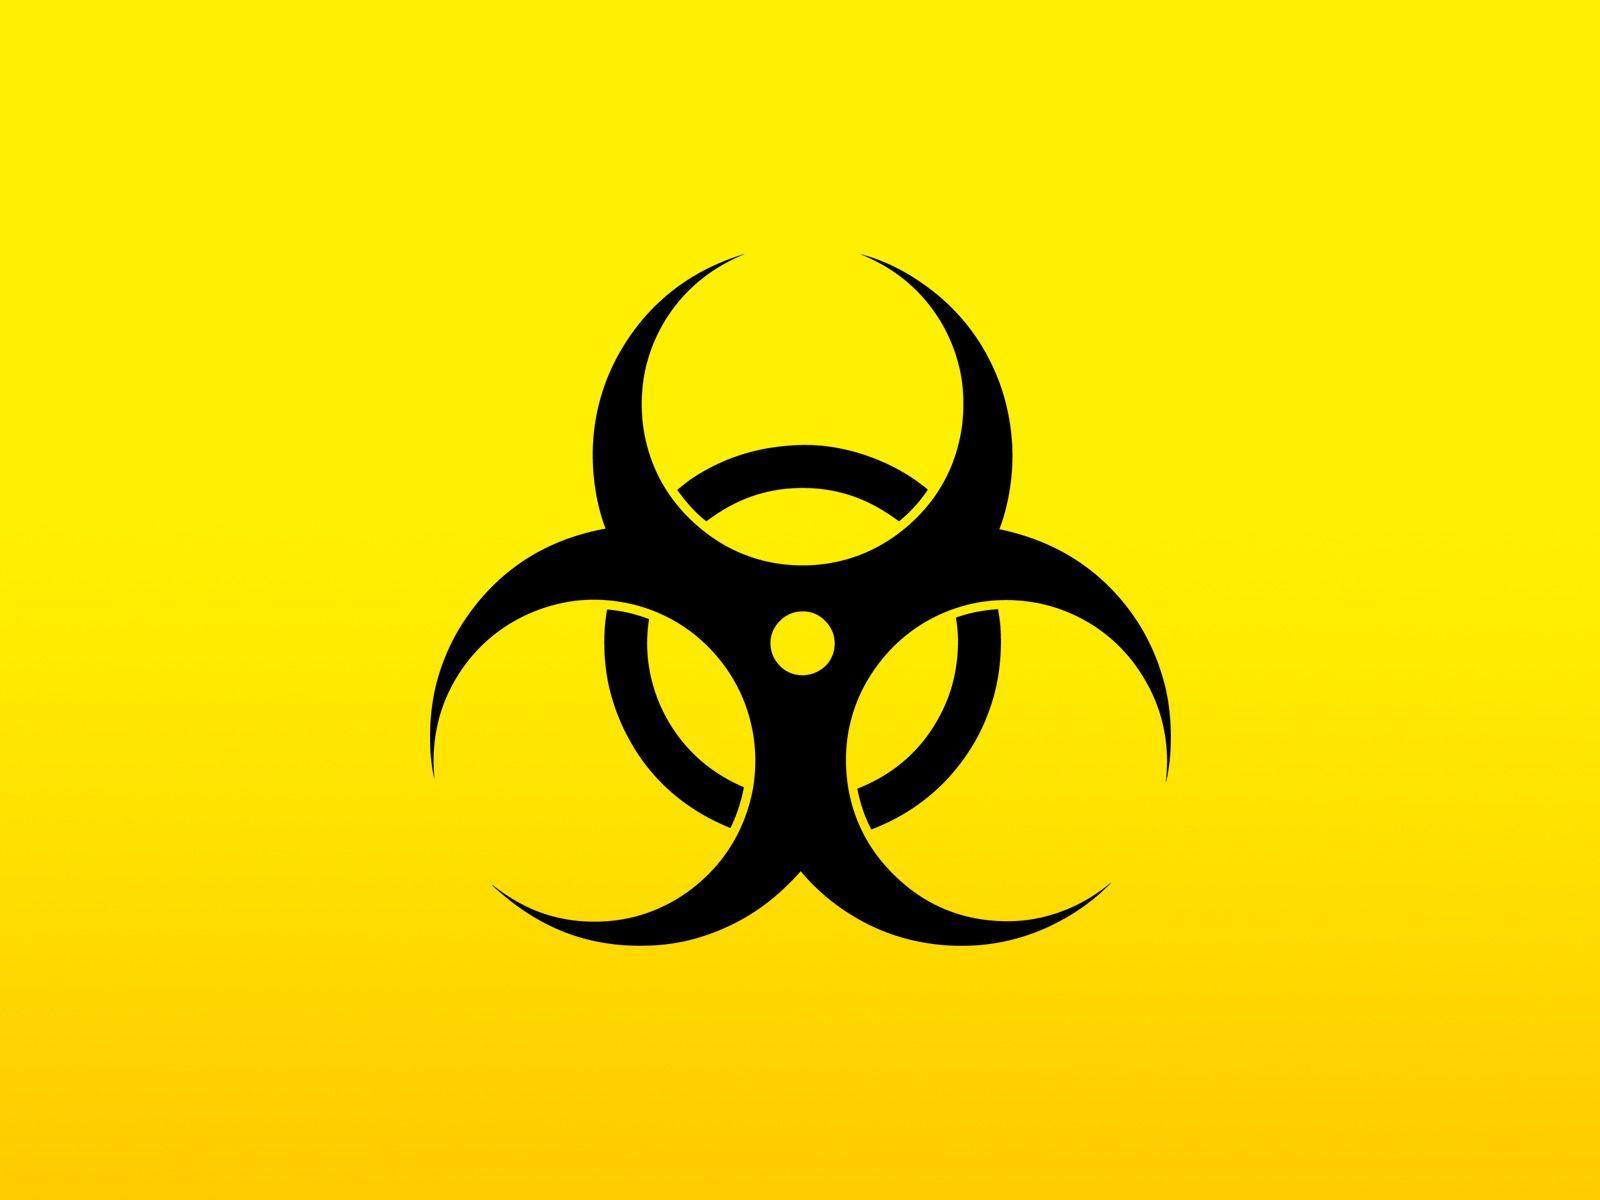 Biohazard Symbol Wallpapers - Wallpaper Cave